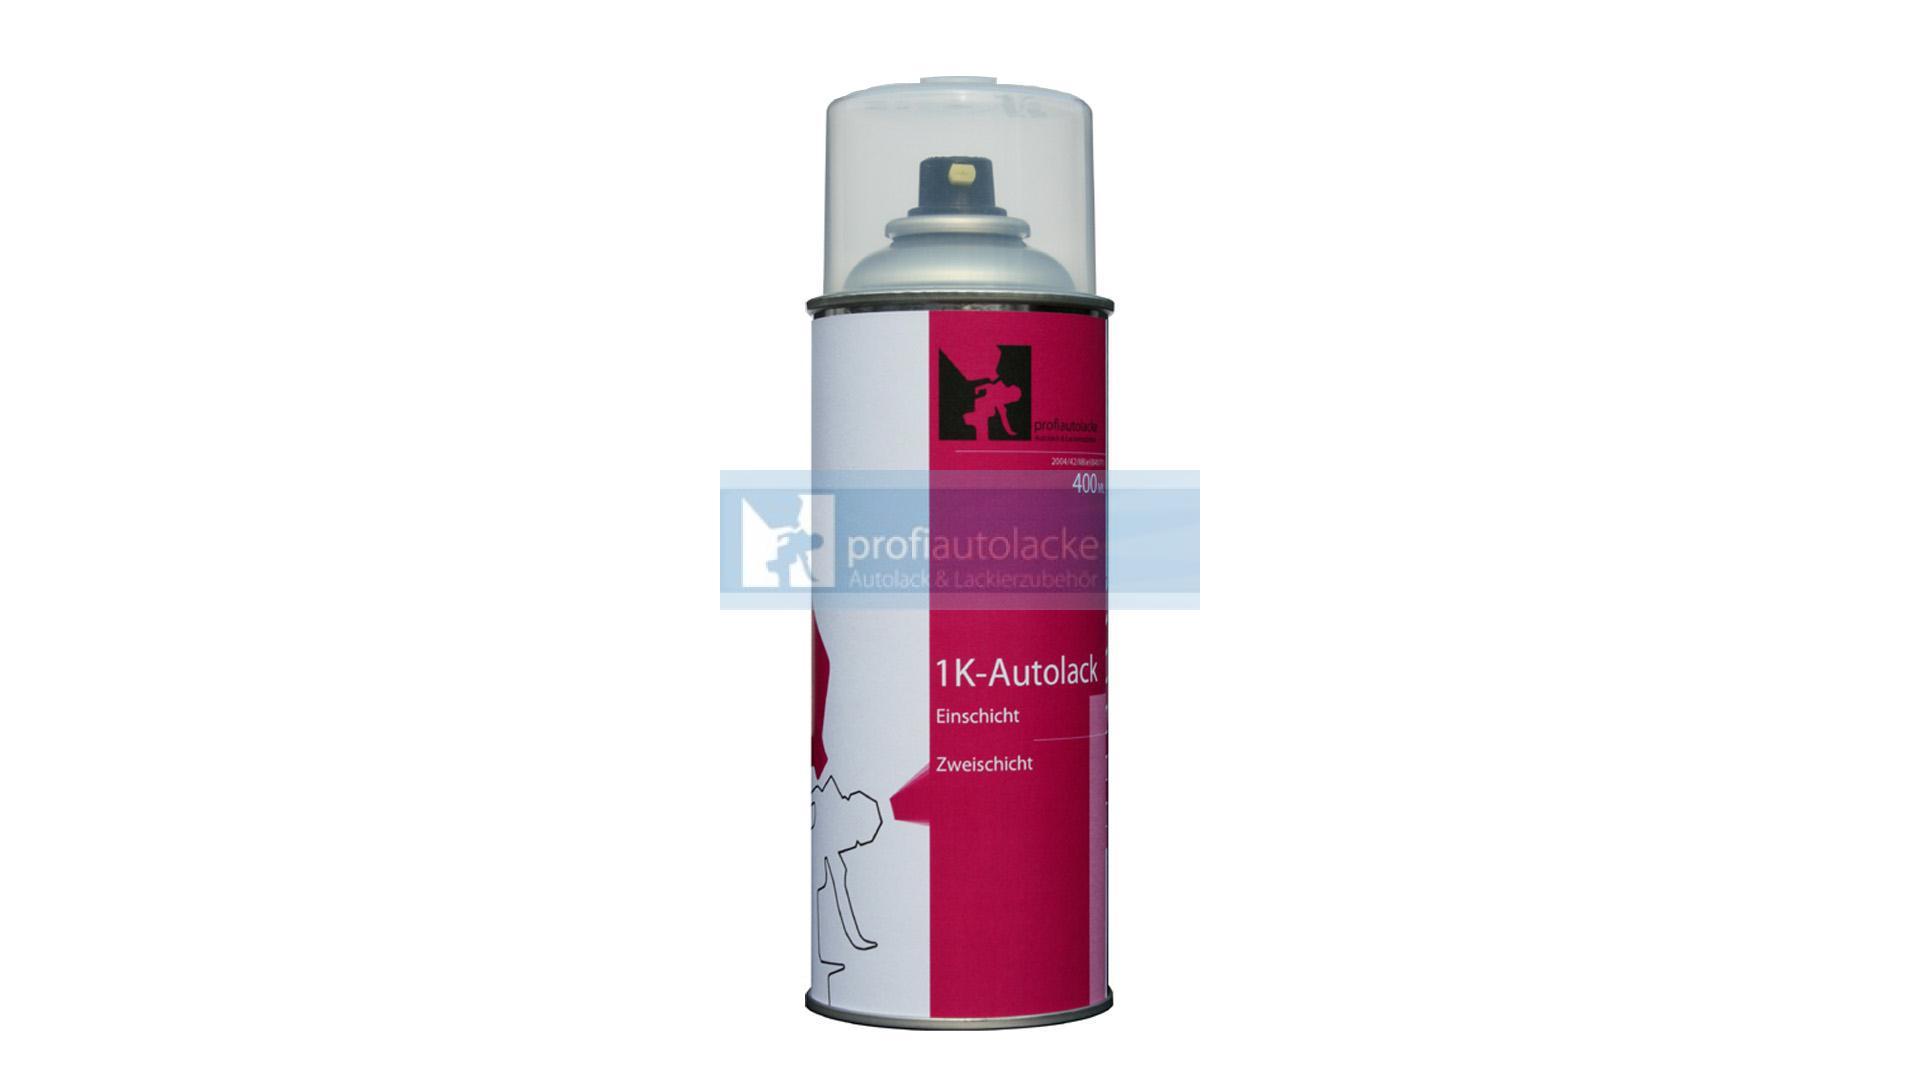 Spray Can Ral Matte 4004 Bordeaux Purple Acrylic Single Coat Paint 400ml Ebay